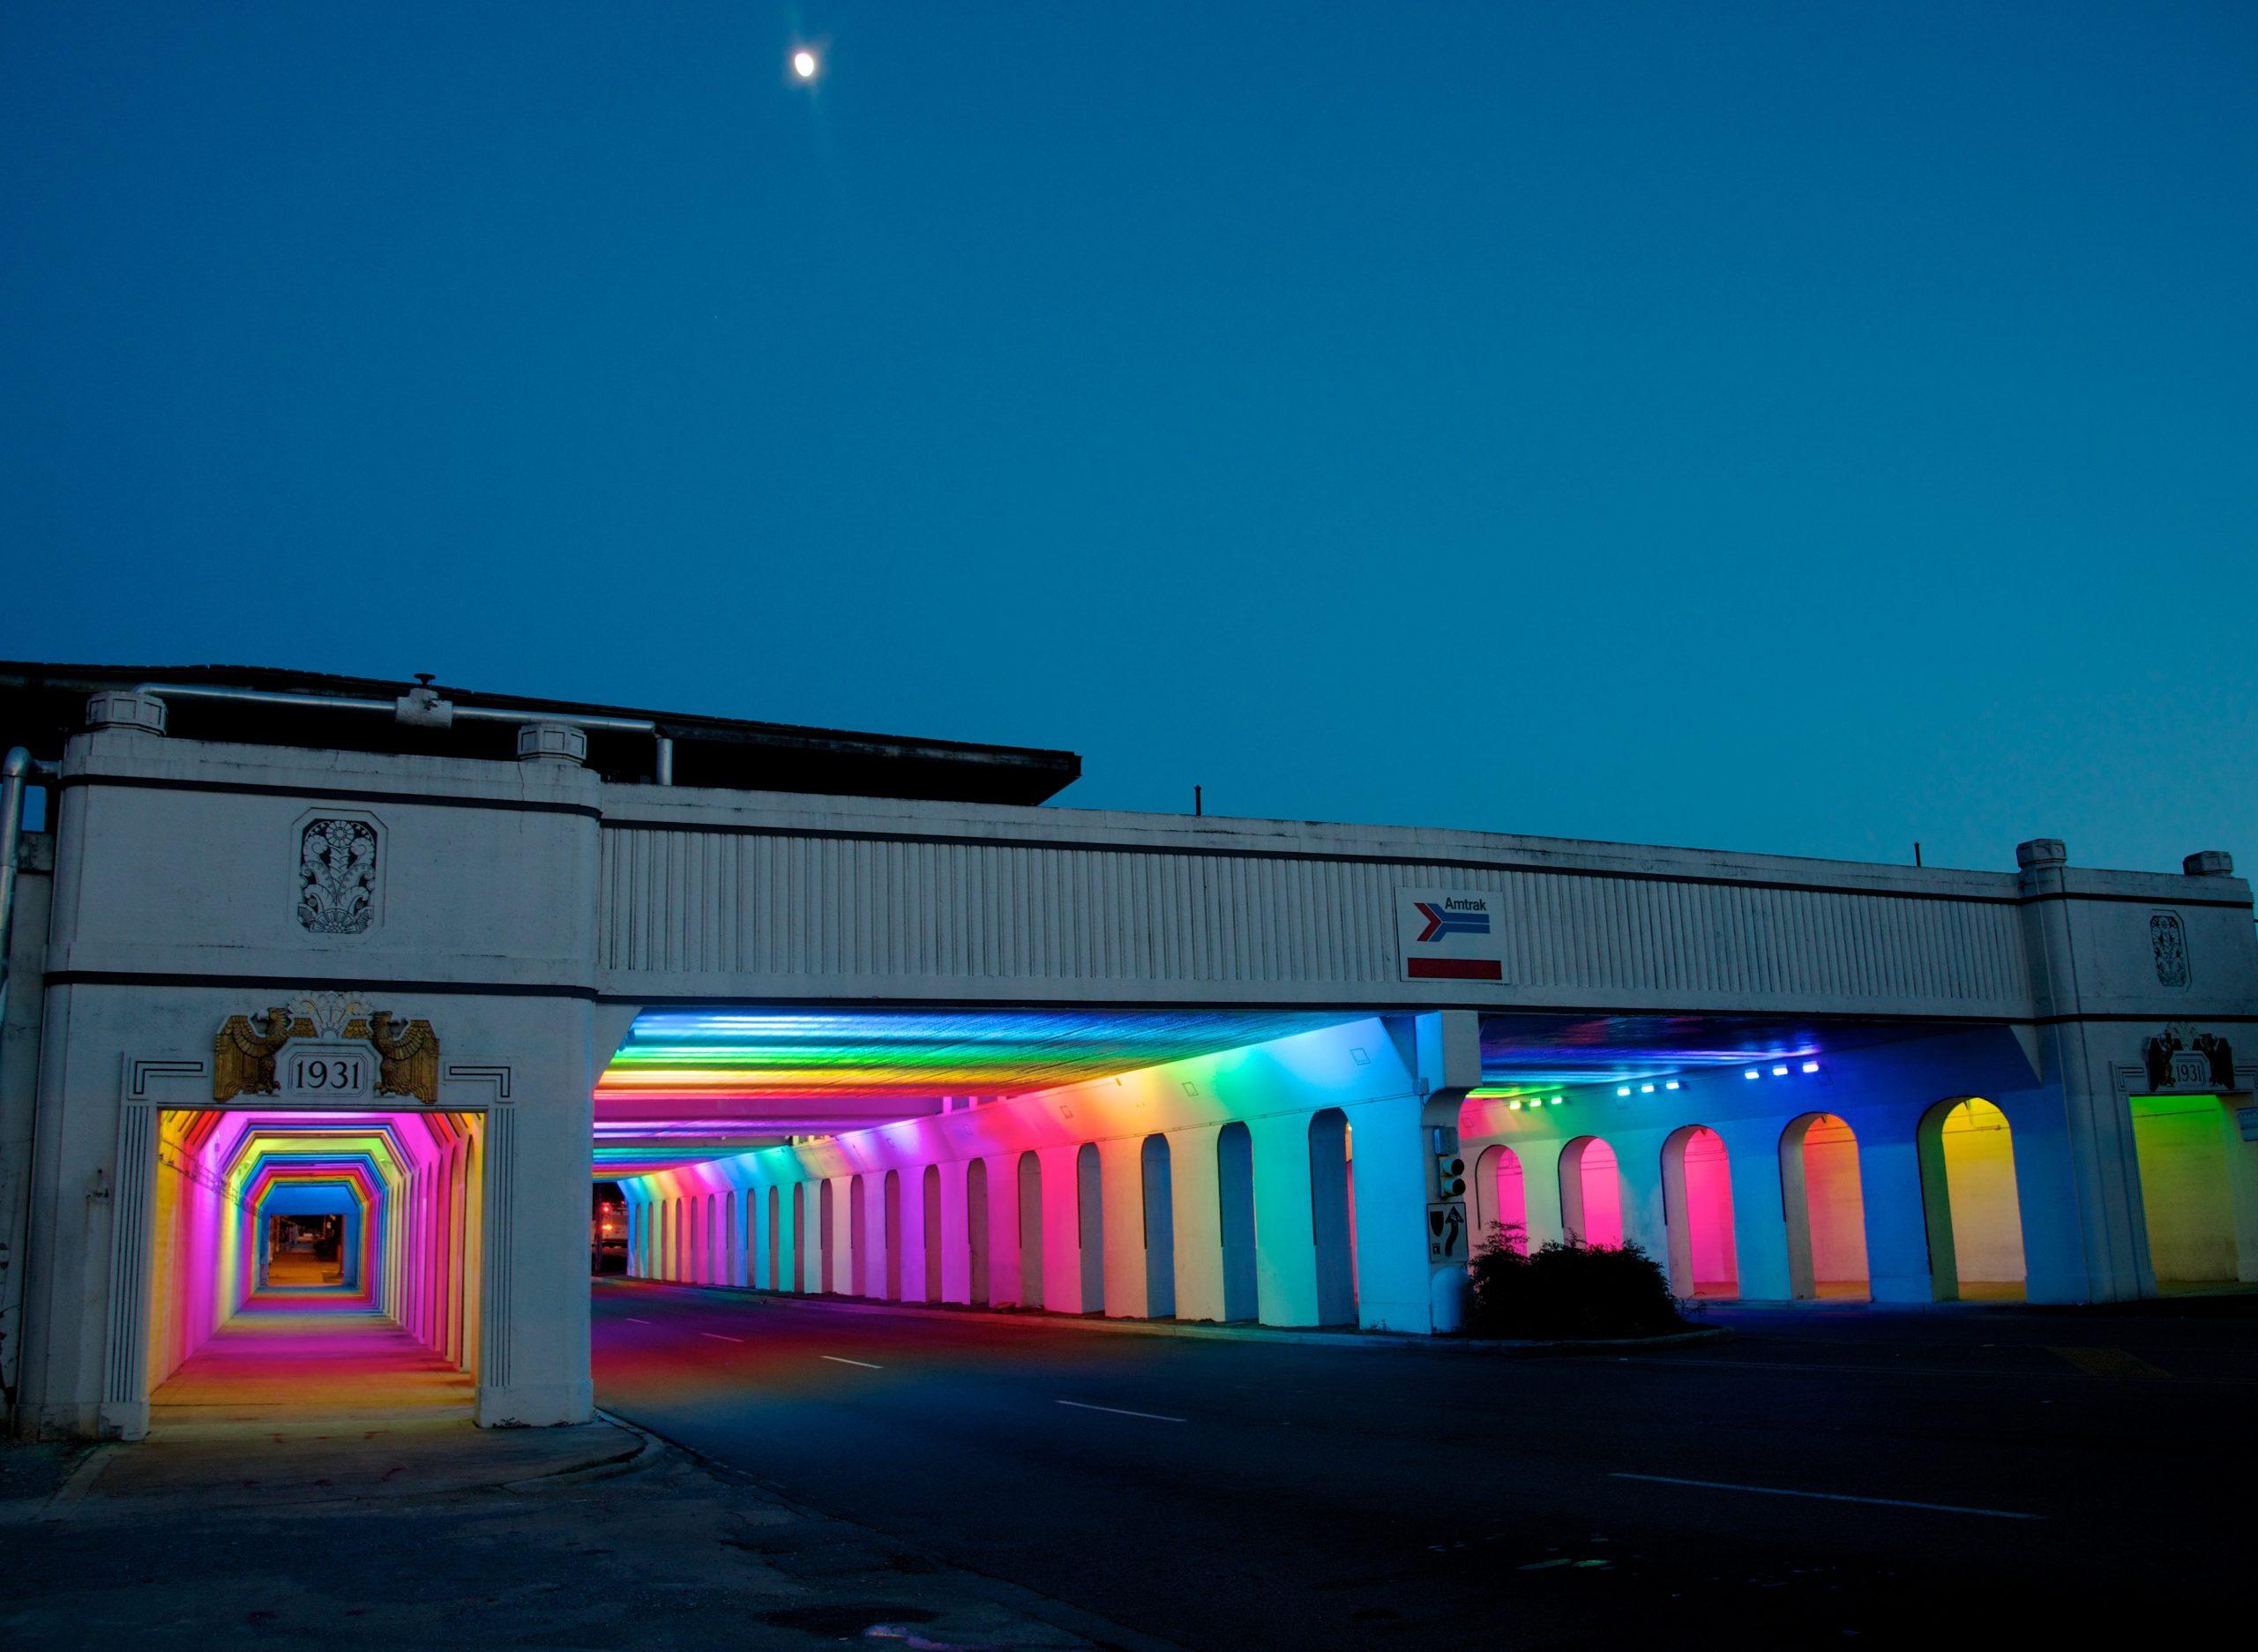 Light Rails - The 18th Street light installation in downtown, Birmingham by artist Bill FitzGibbons